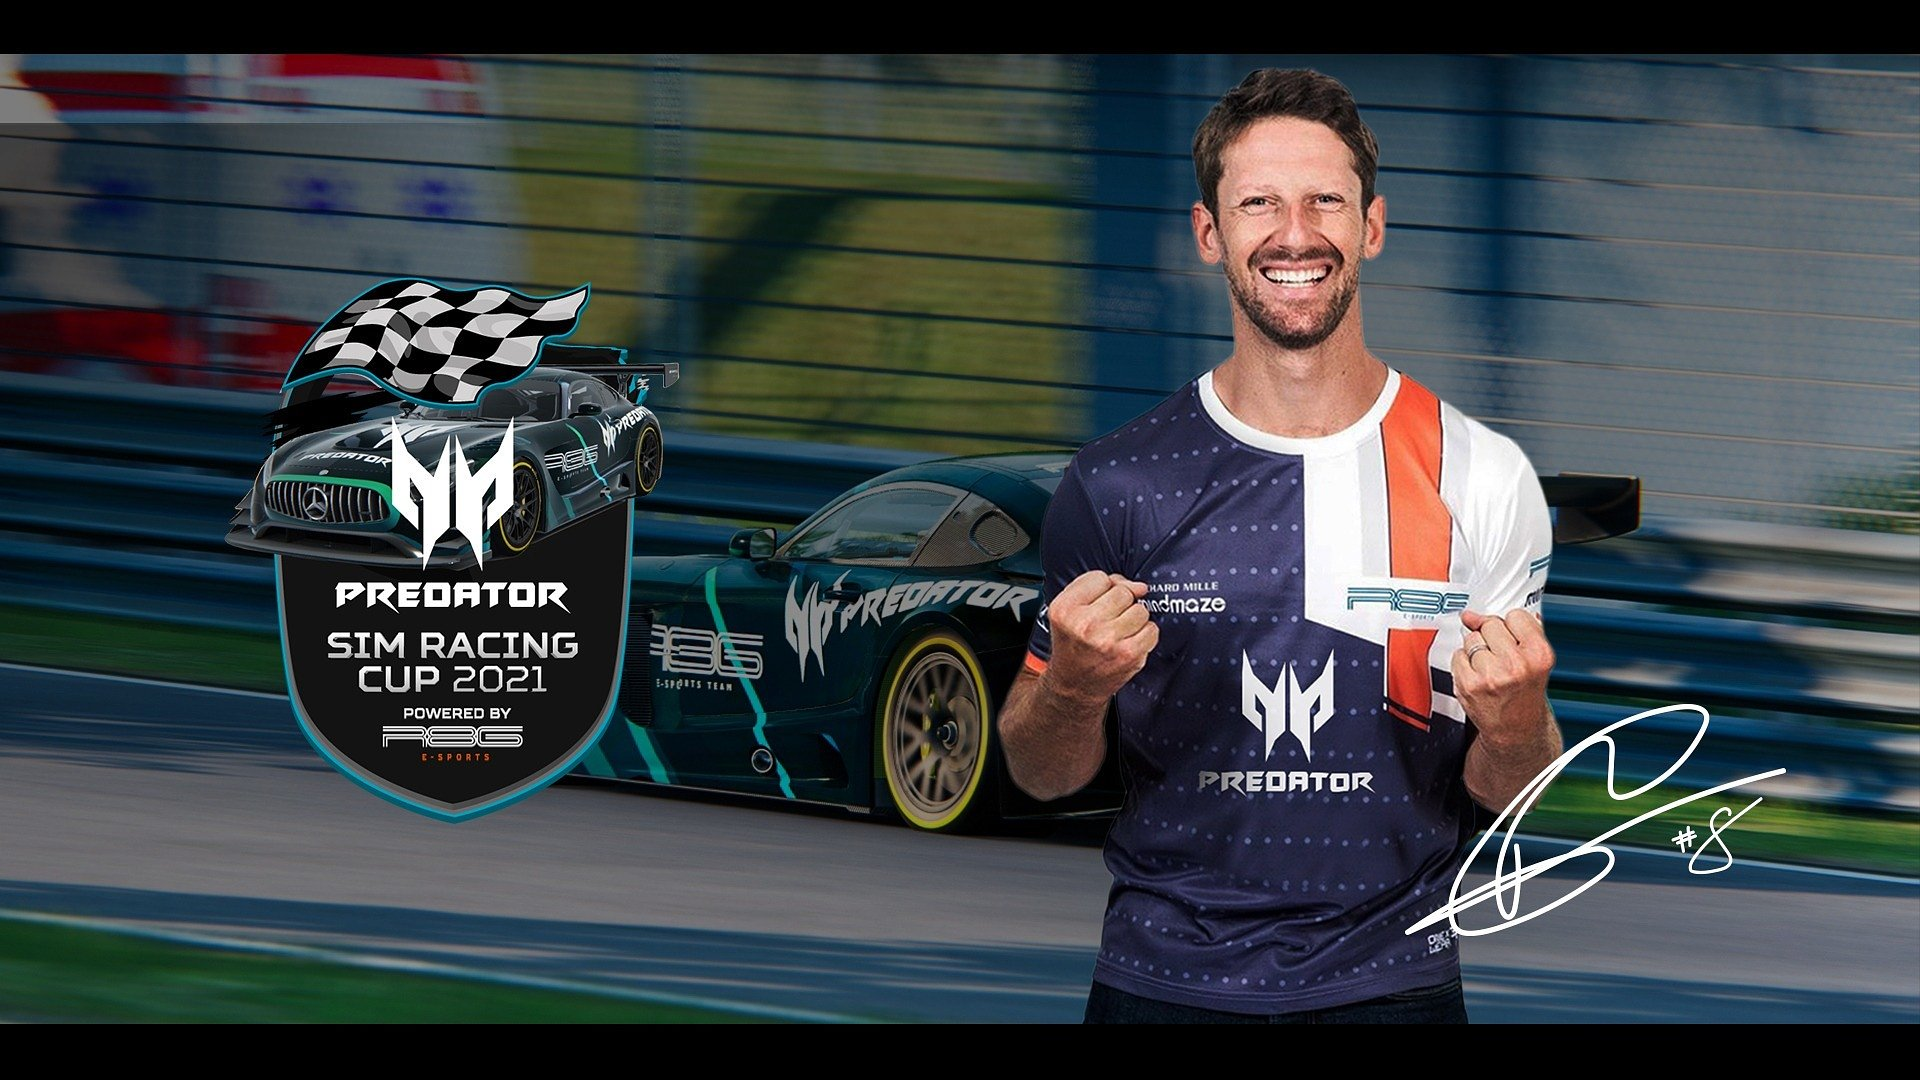 Polski finał Predator Sim Racing Cup 2021. Czas start!